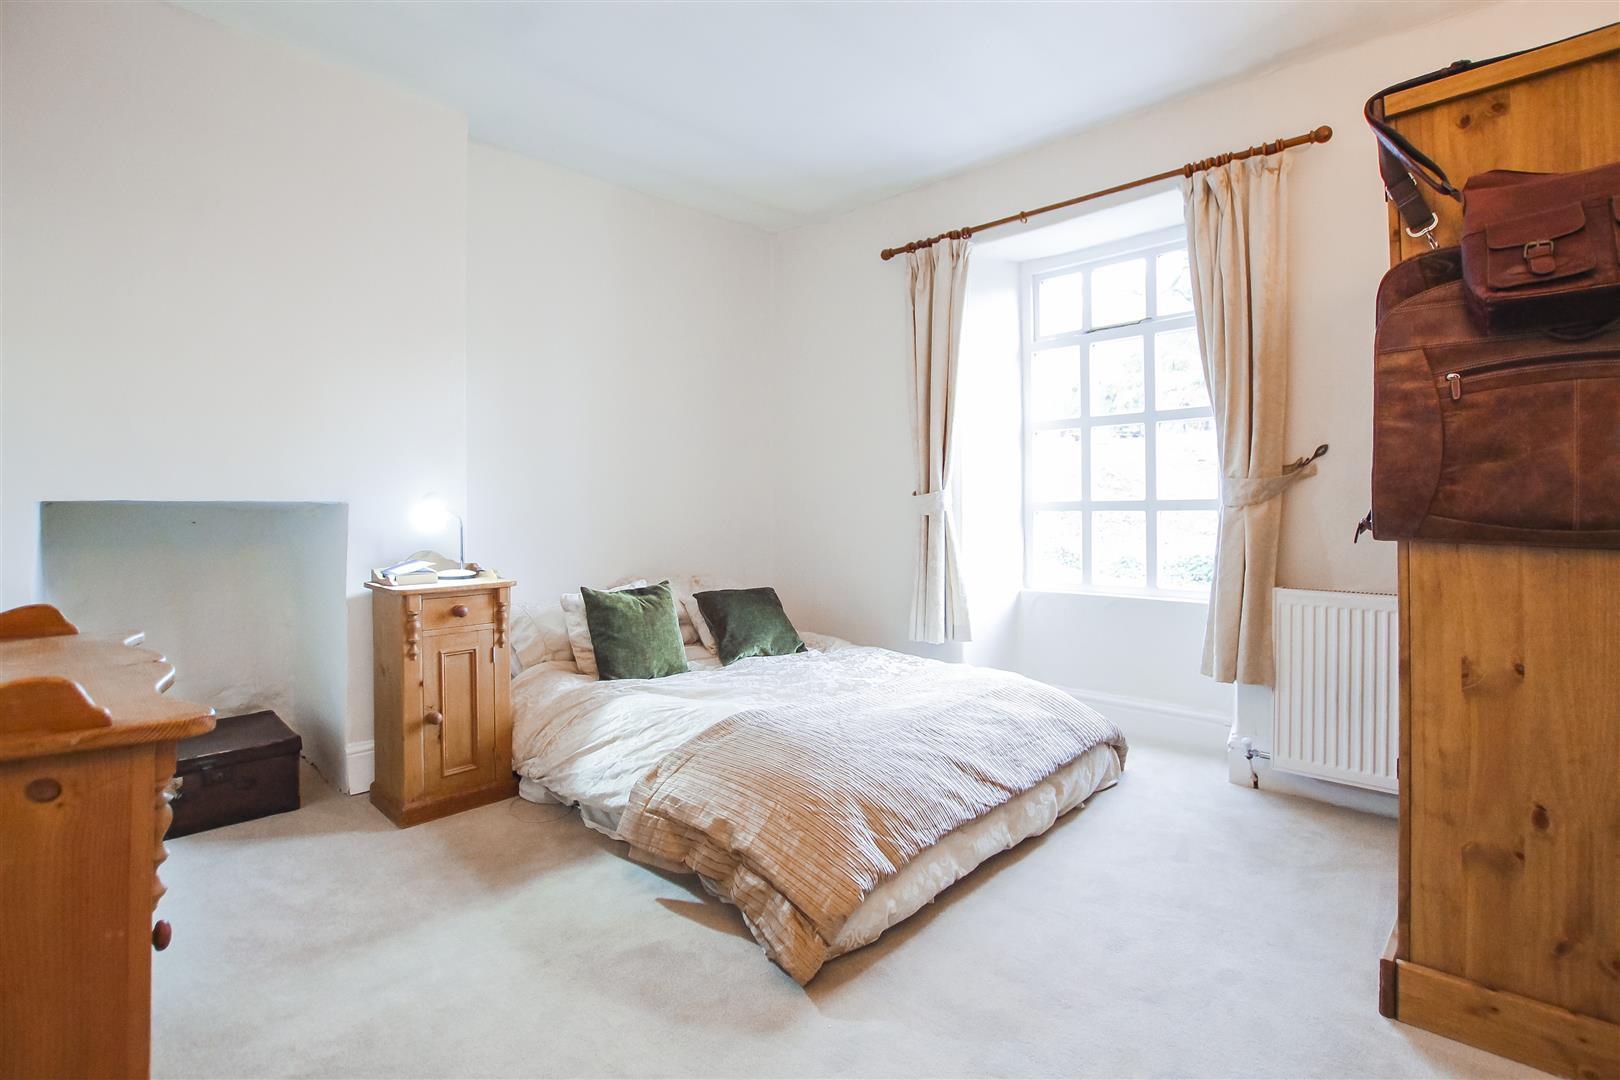 3 Bedroom Semi-detached House For Sale - Bedroom